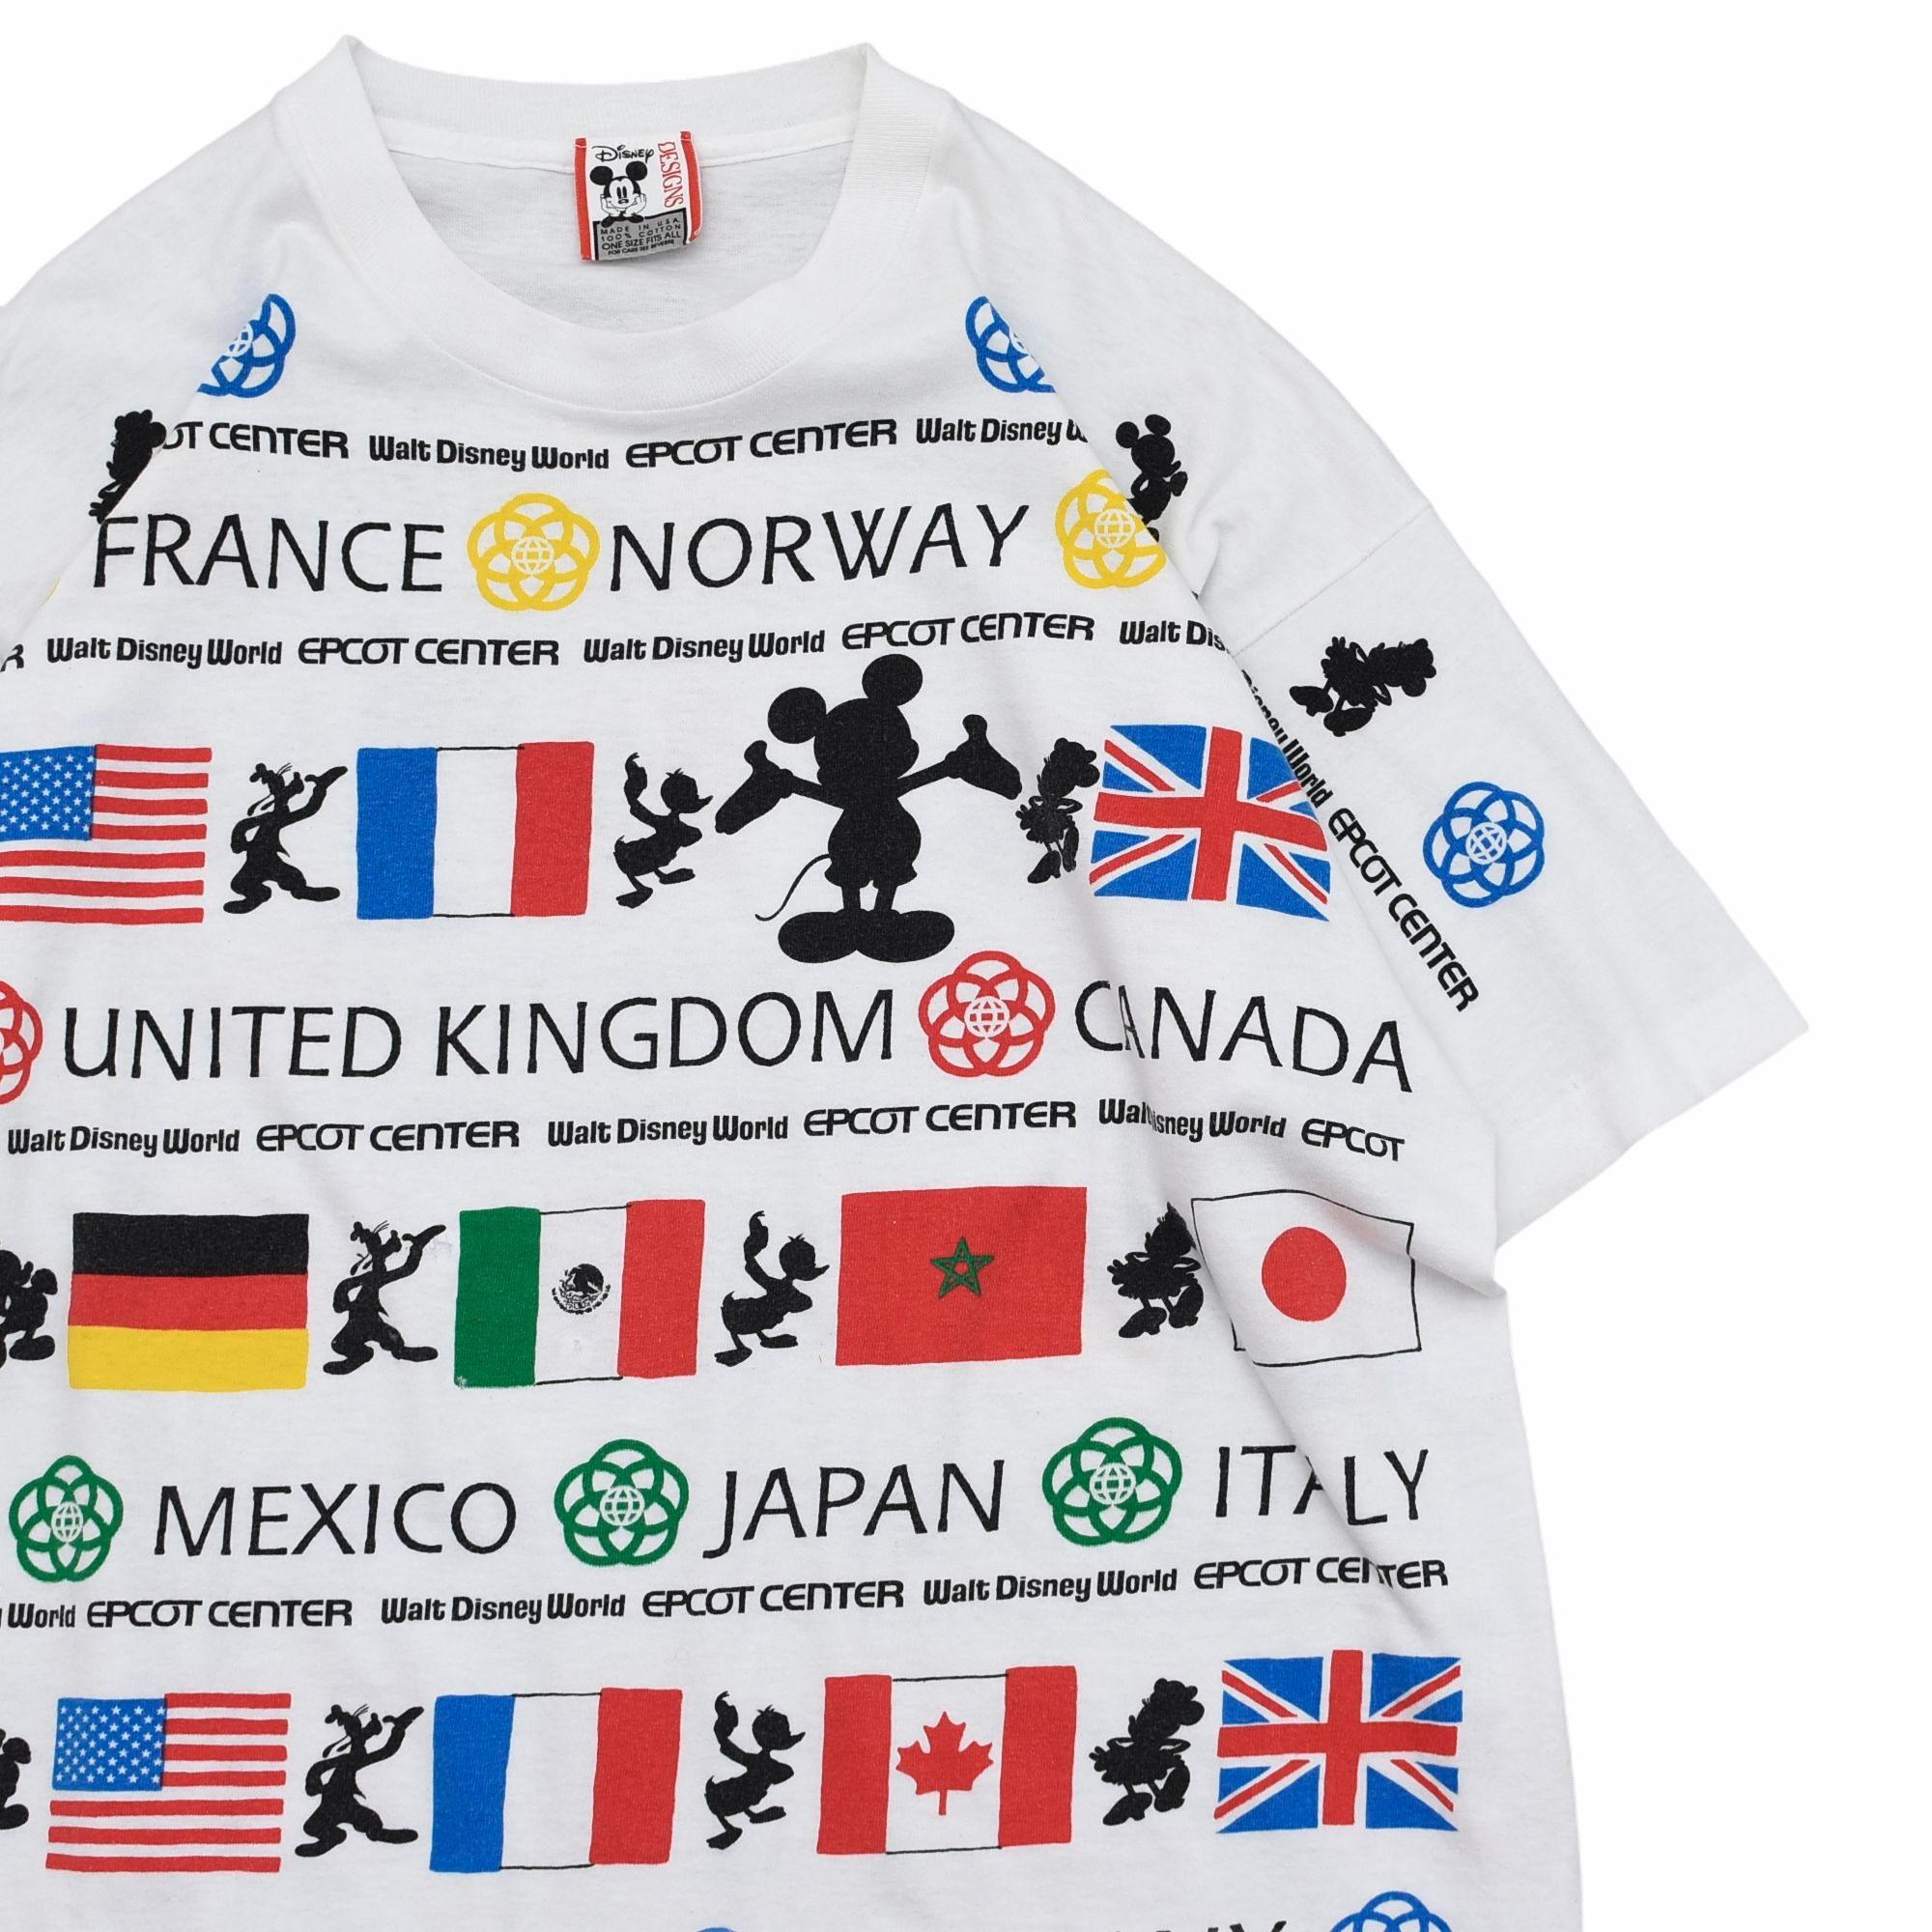 90's Disney DESIGN full pattern T-shirt Made in USA